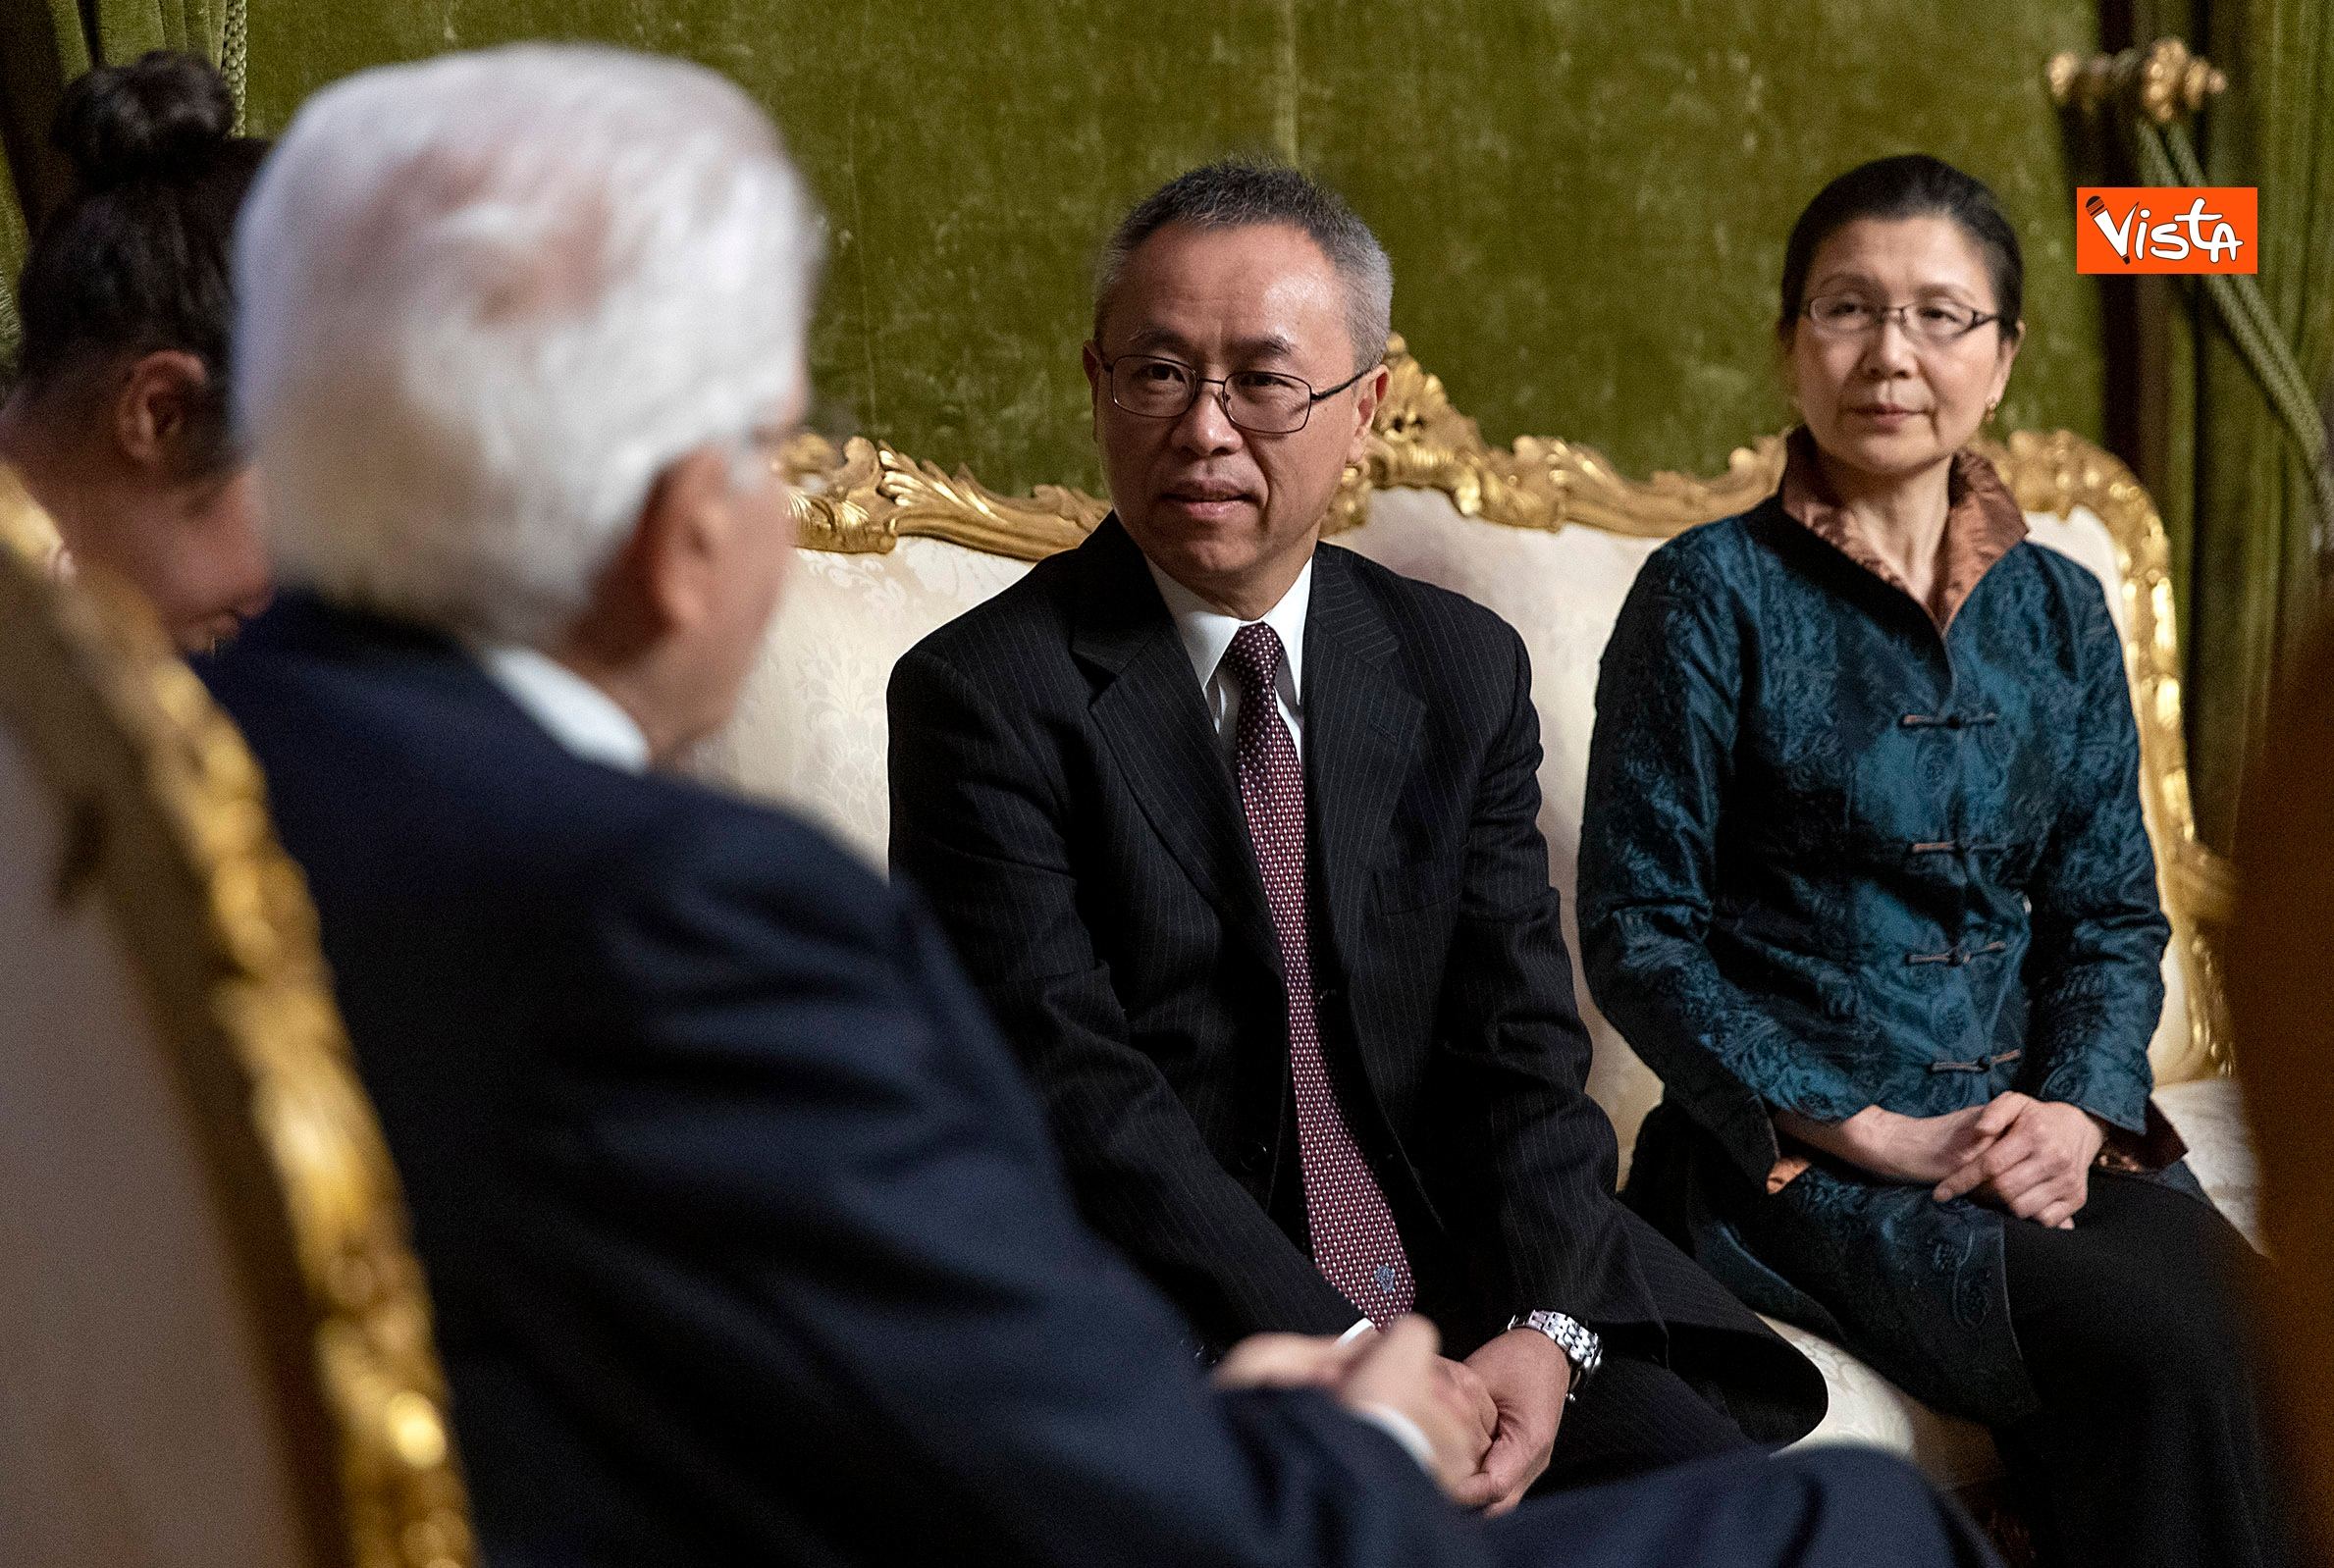 13-02-20 Italia Cina Mattarella incontra ambasciatore cinese in Italia Li Junhua_05